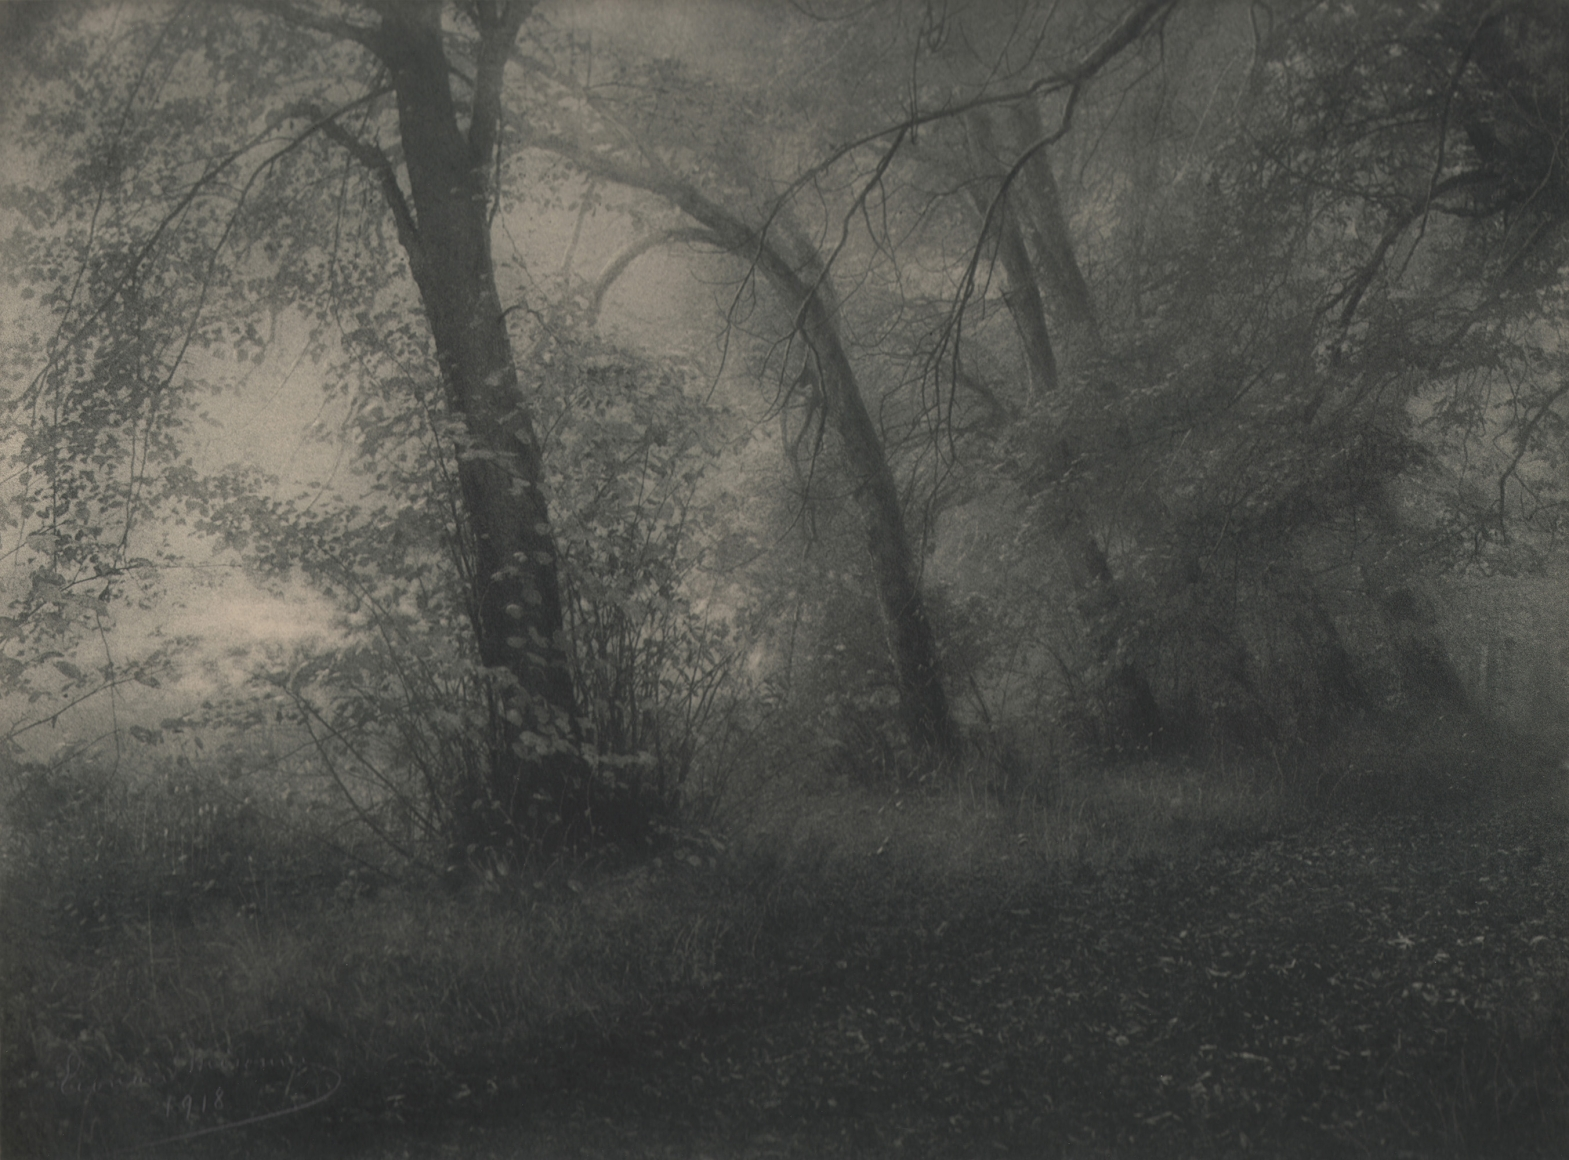 28. Léonard Misonne, Bord de l'etang, 1918. Wooded scene with trees and brush. Gray/green-tinted print.